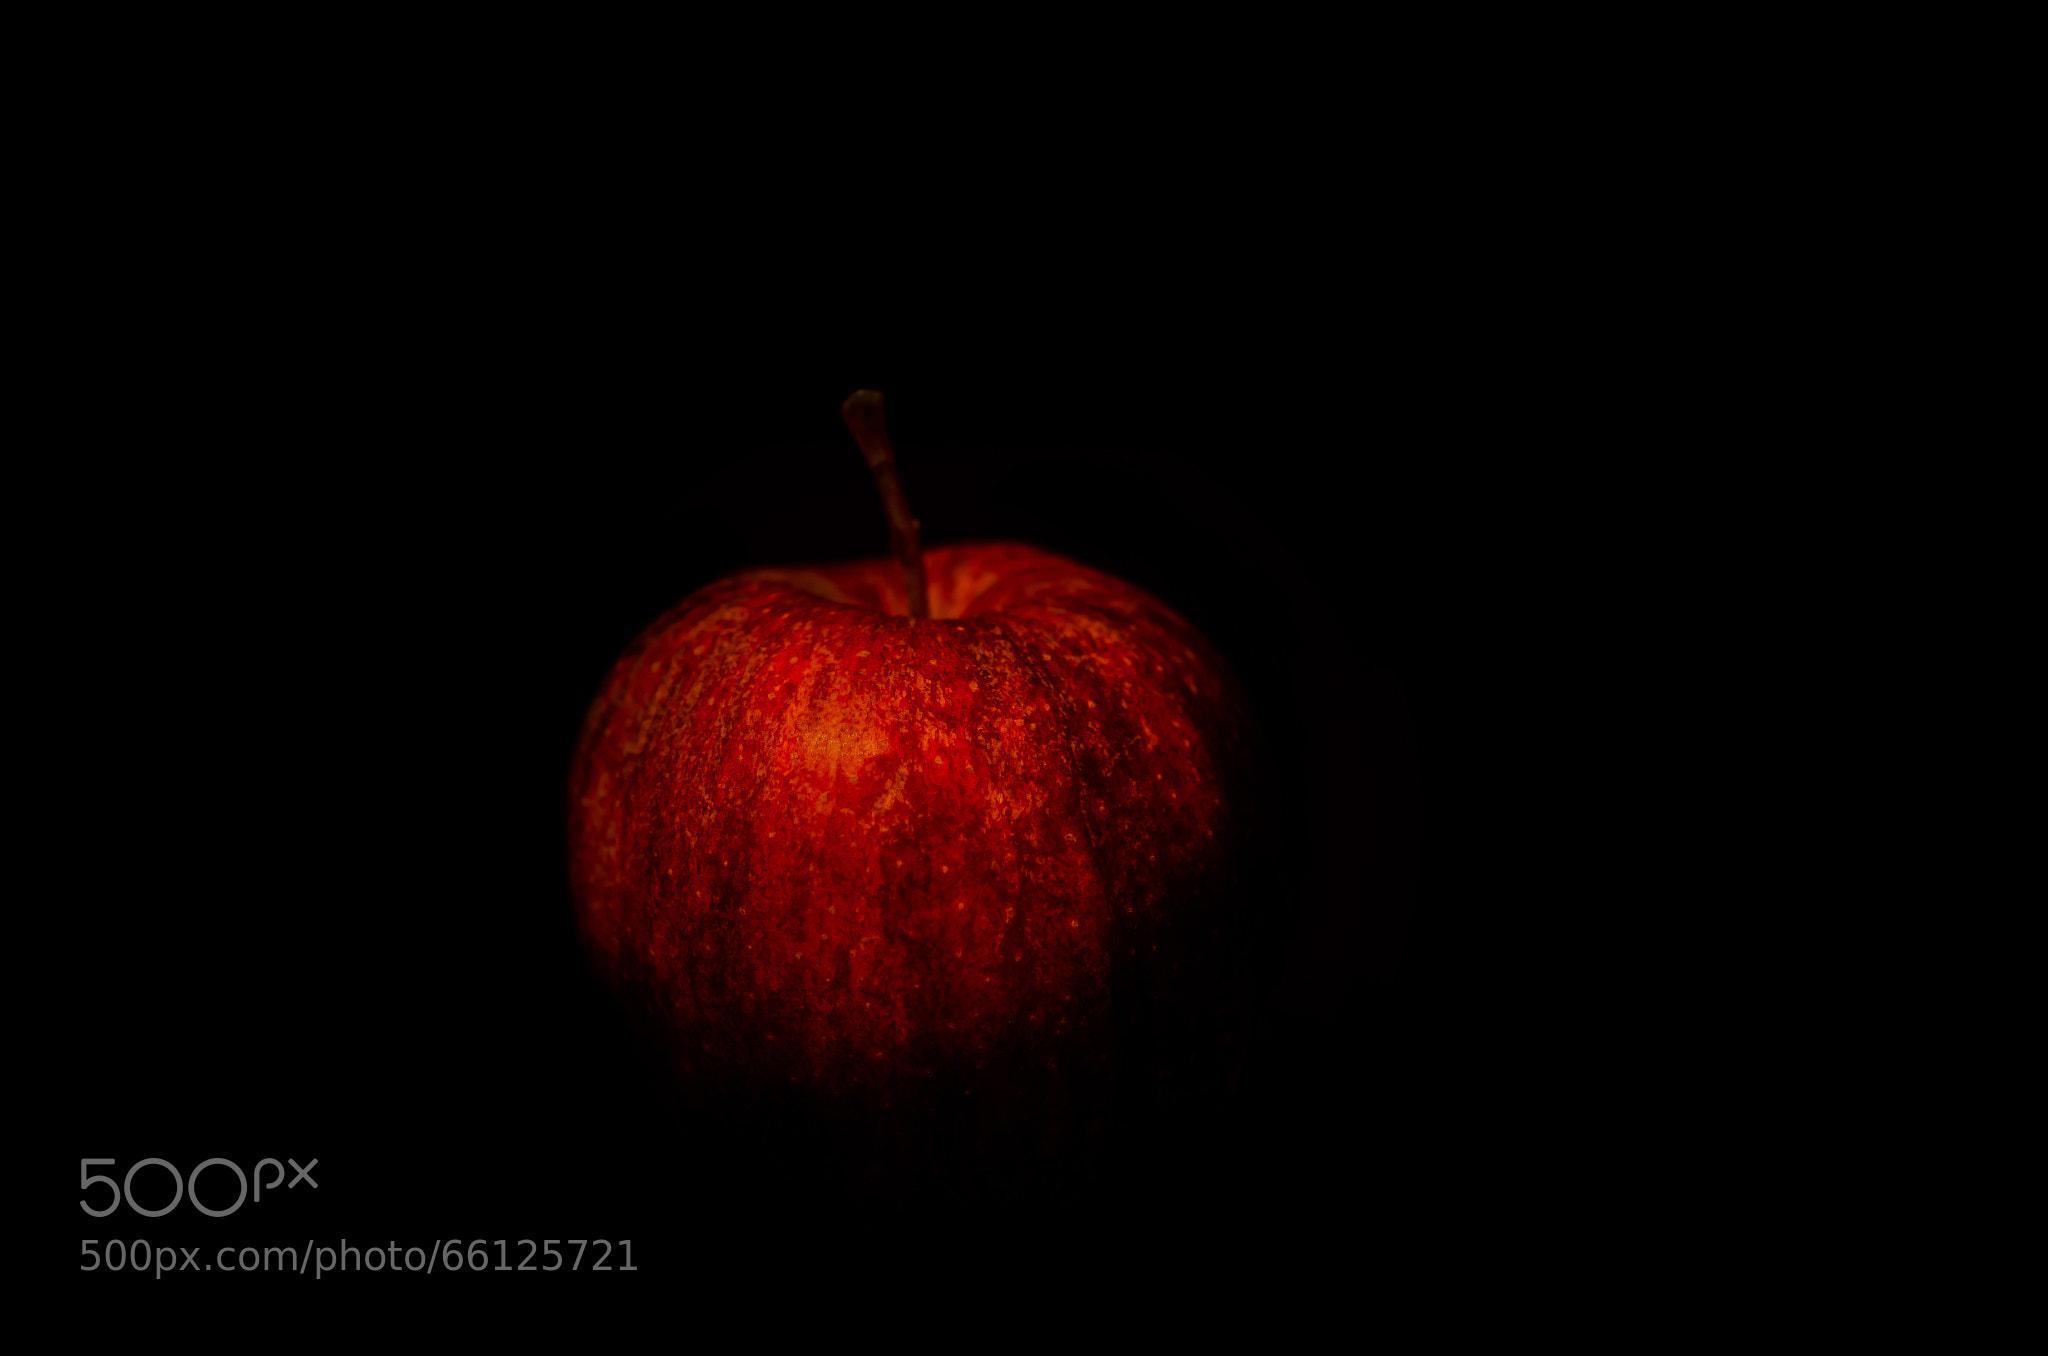 Portrait of an Apple